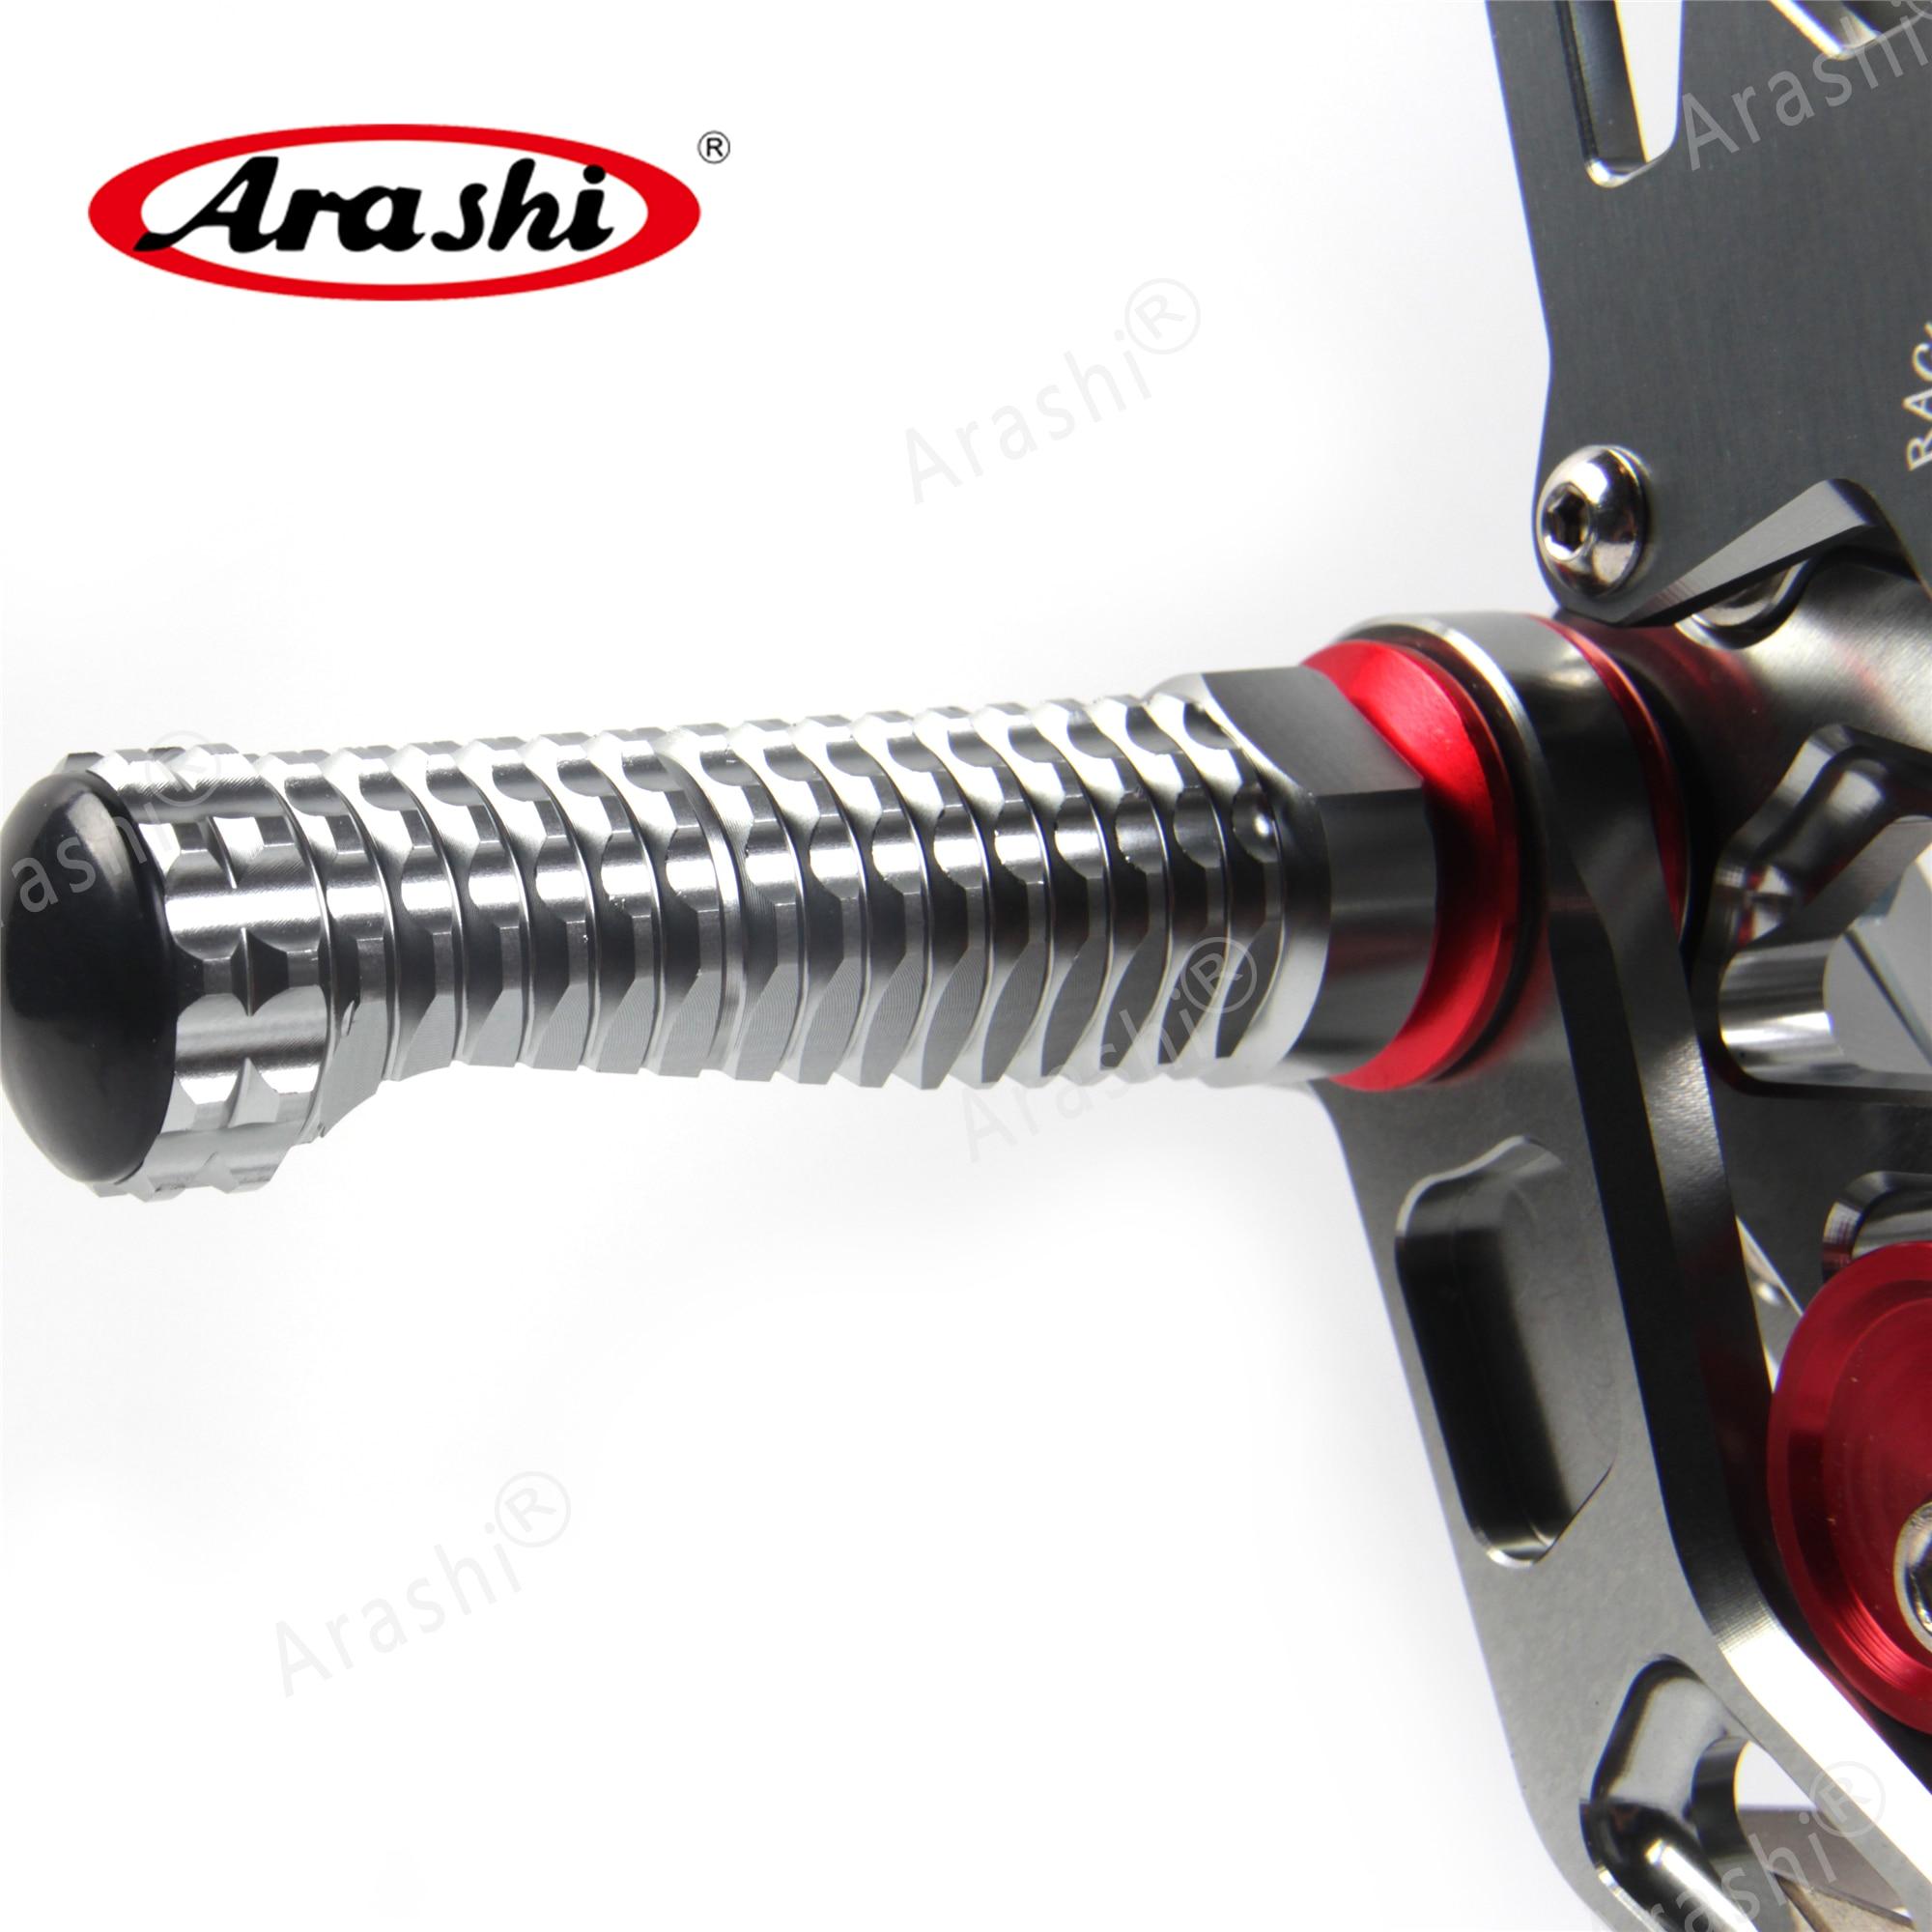 Image 5 - Arashi Motorcycle Adjustable Footrest For HONDA CBR1000RR 2004   2017 Foot Peg Rearsets CBR1000 CBR 1000 RR 2008 2009 2010 2011Foot Rests   -